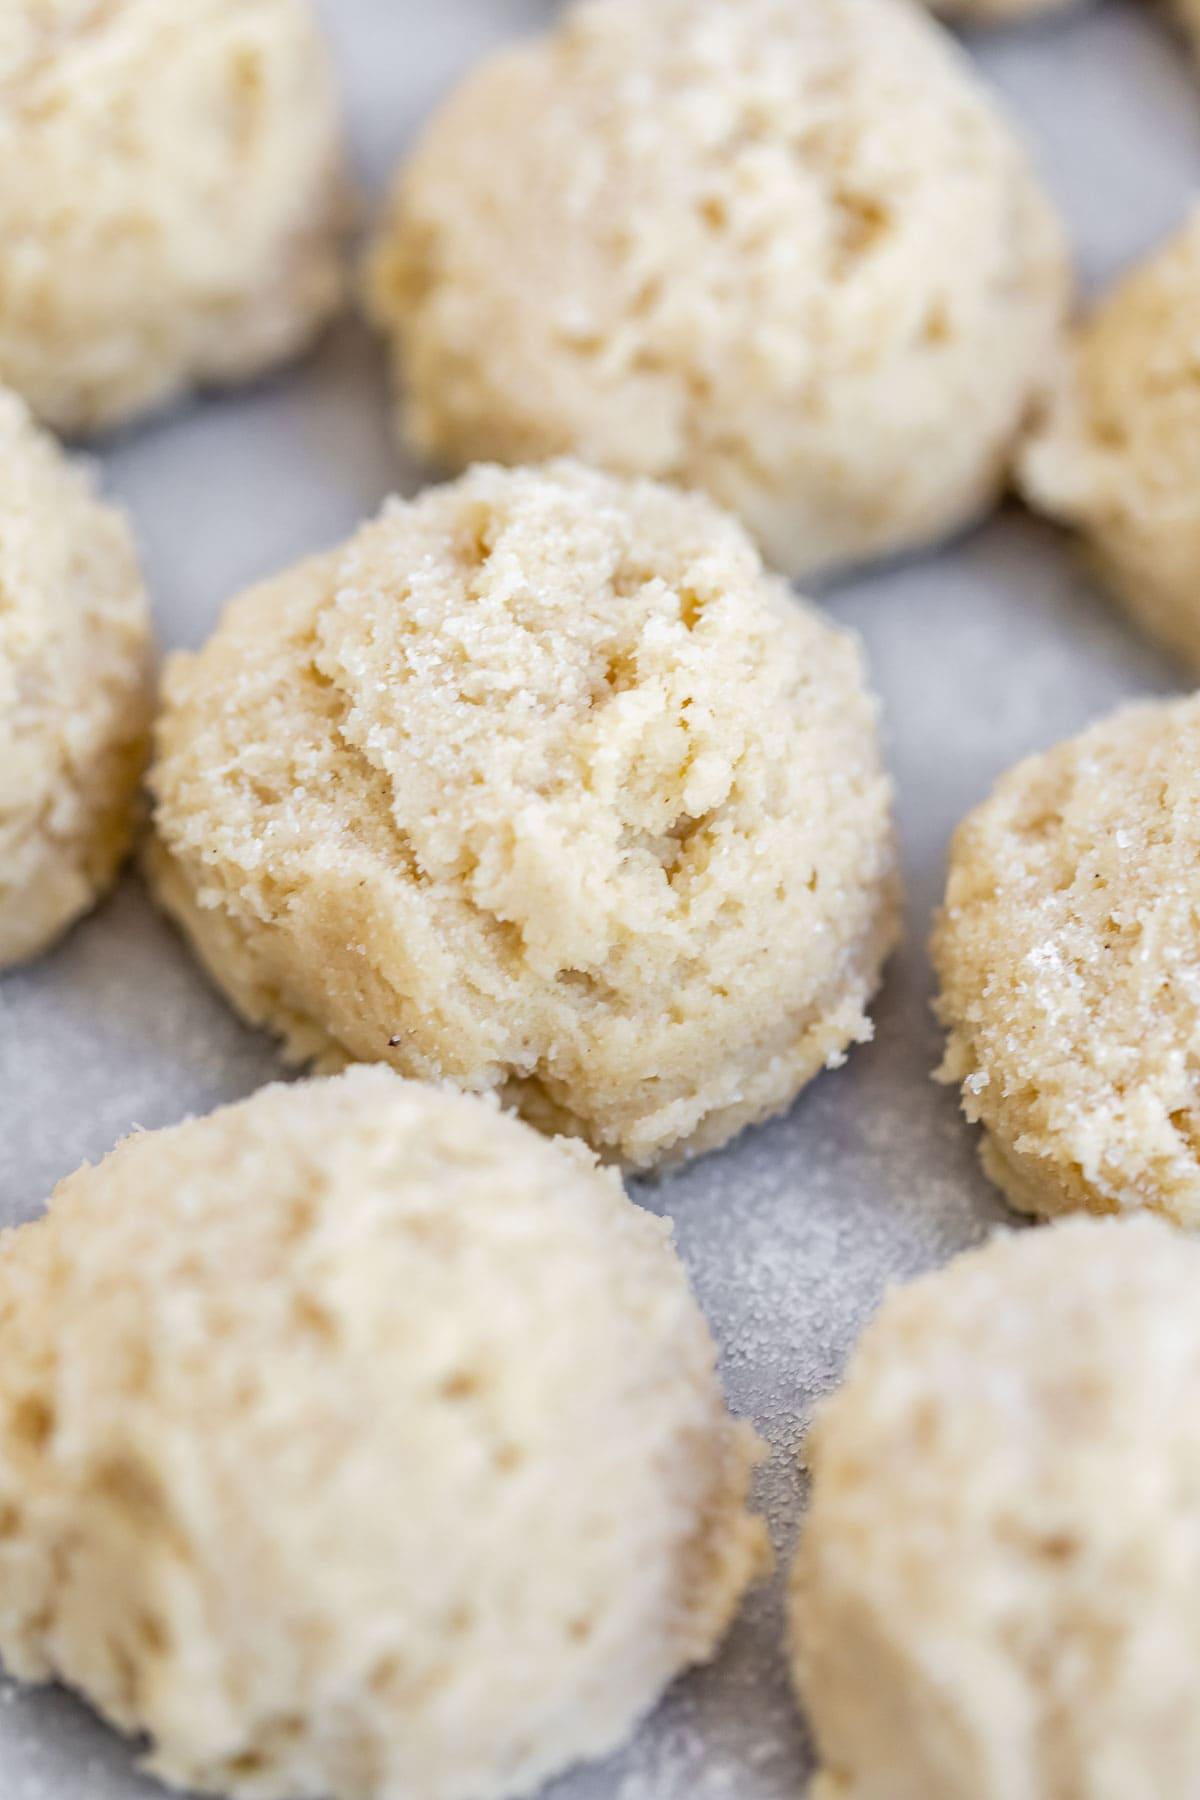 Dough in balls on a baking sheet.